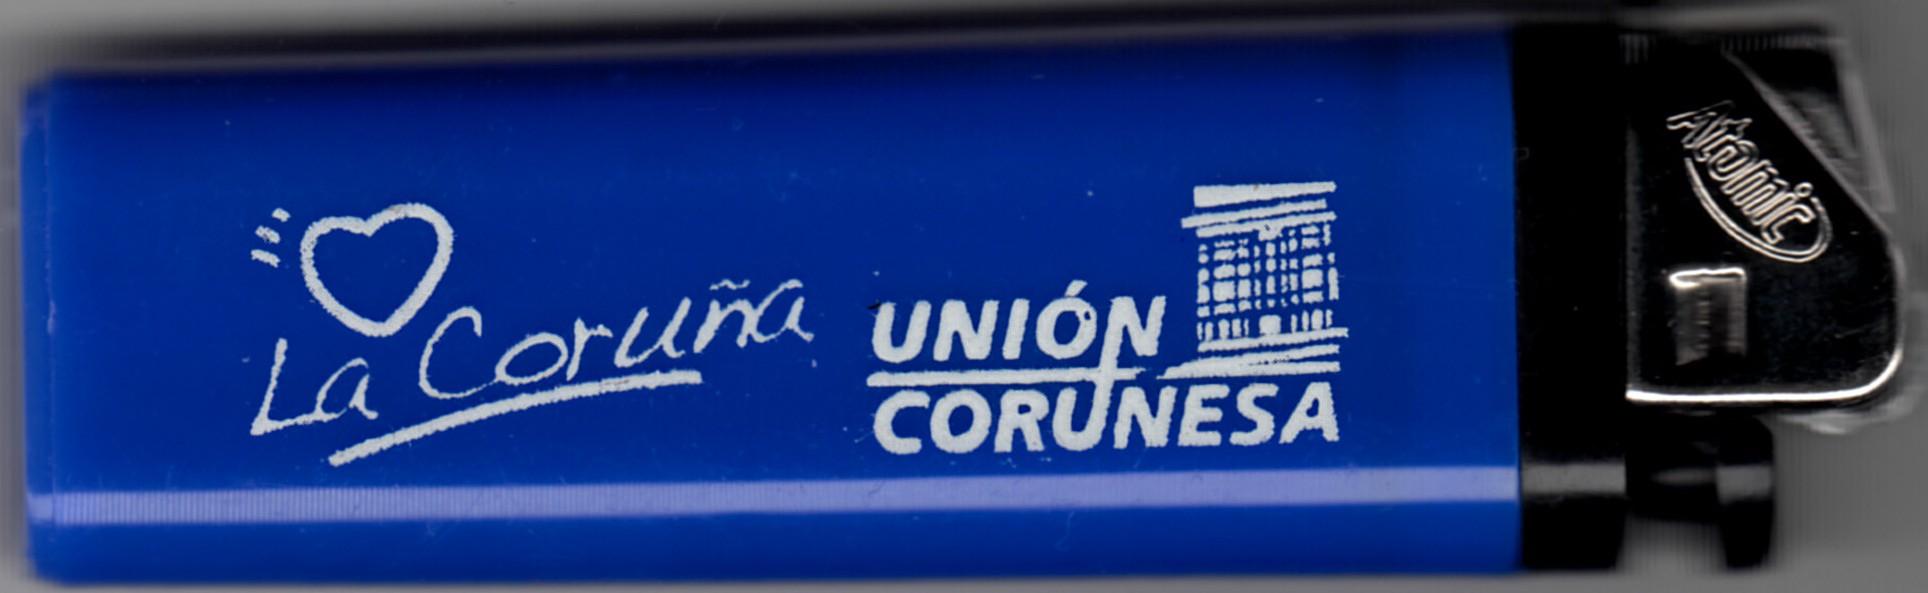 Union_Corunesa_isqueiro_x